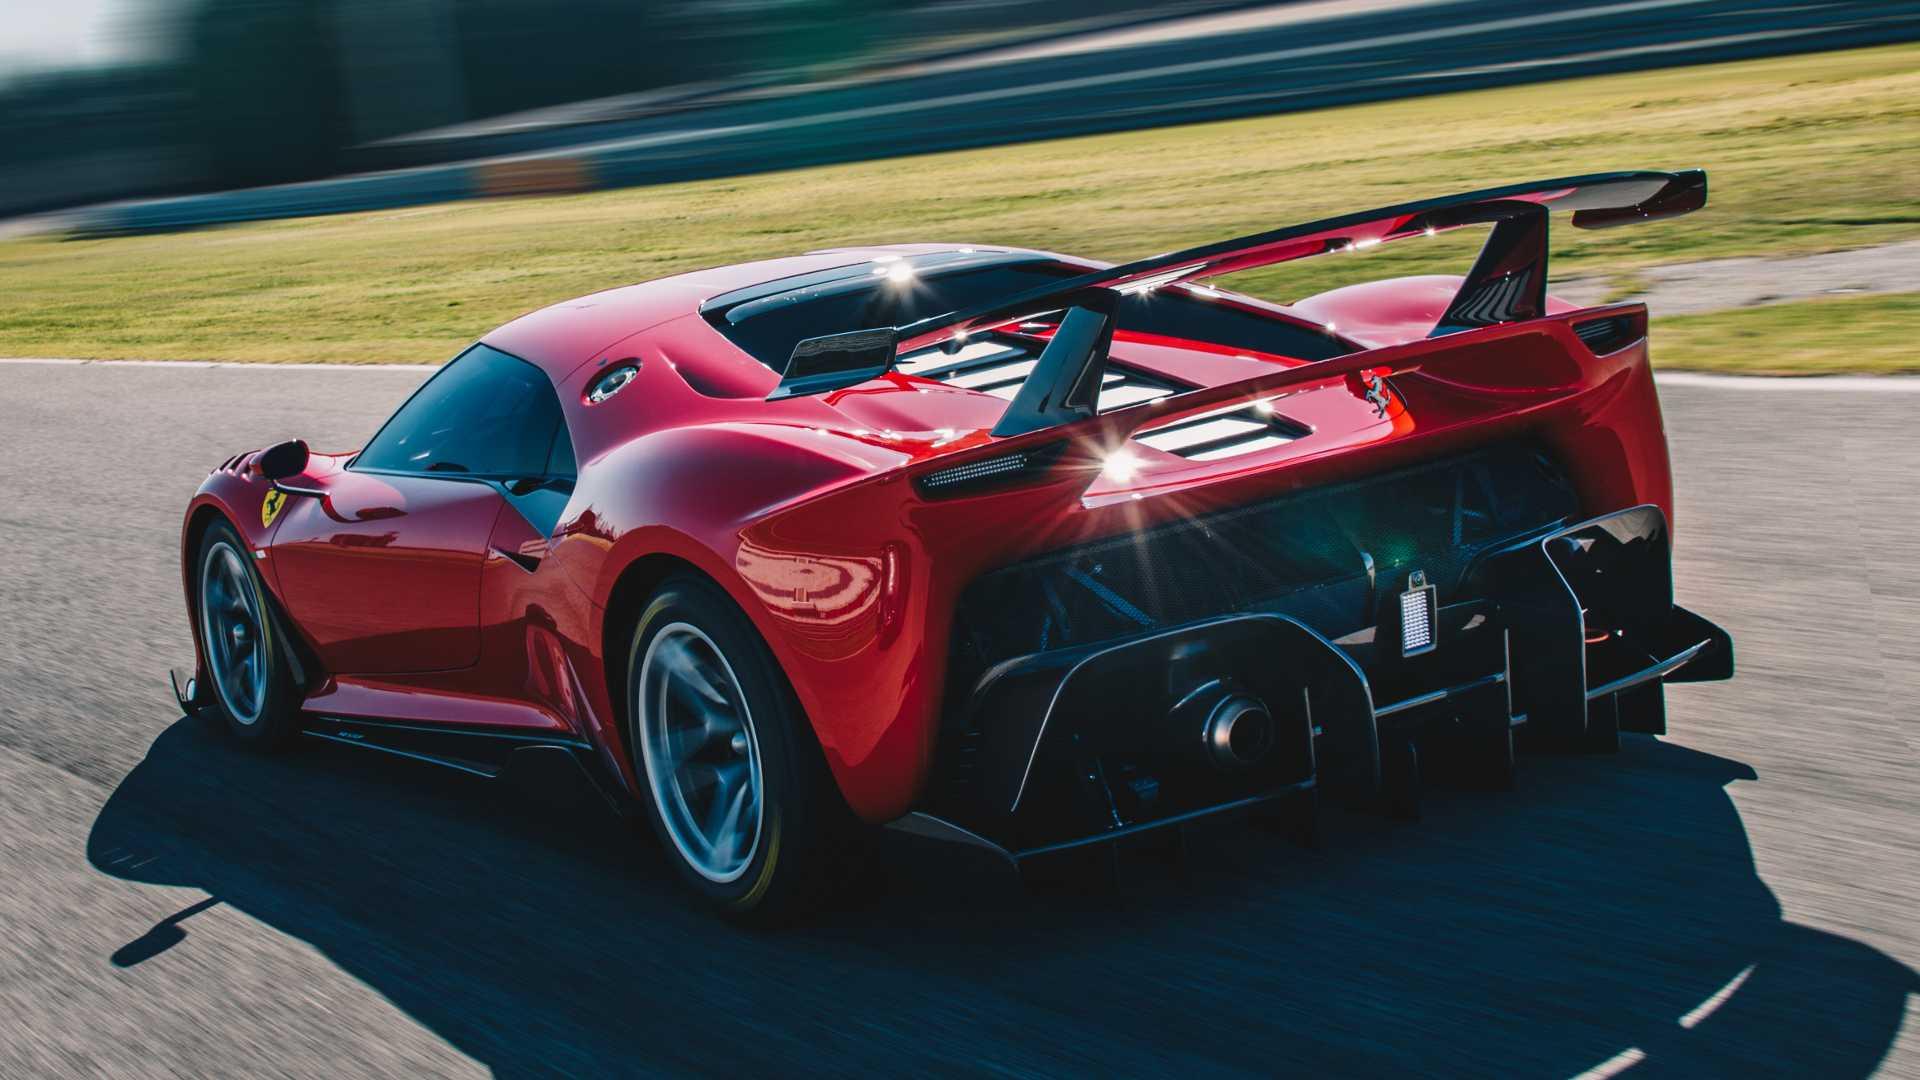 2019 Ferrari P80/C Rear Three-Quarter Wallpapers (4)